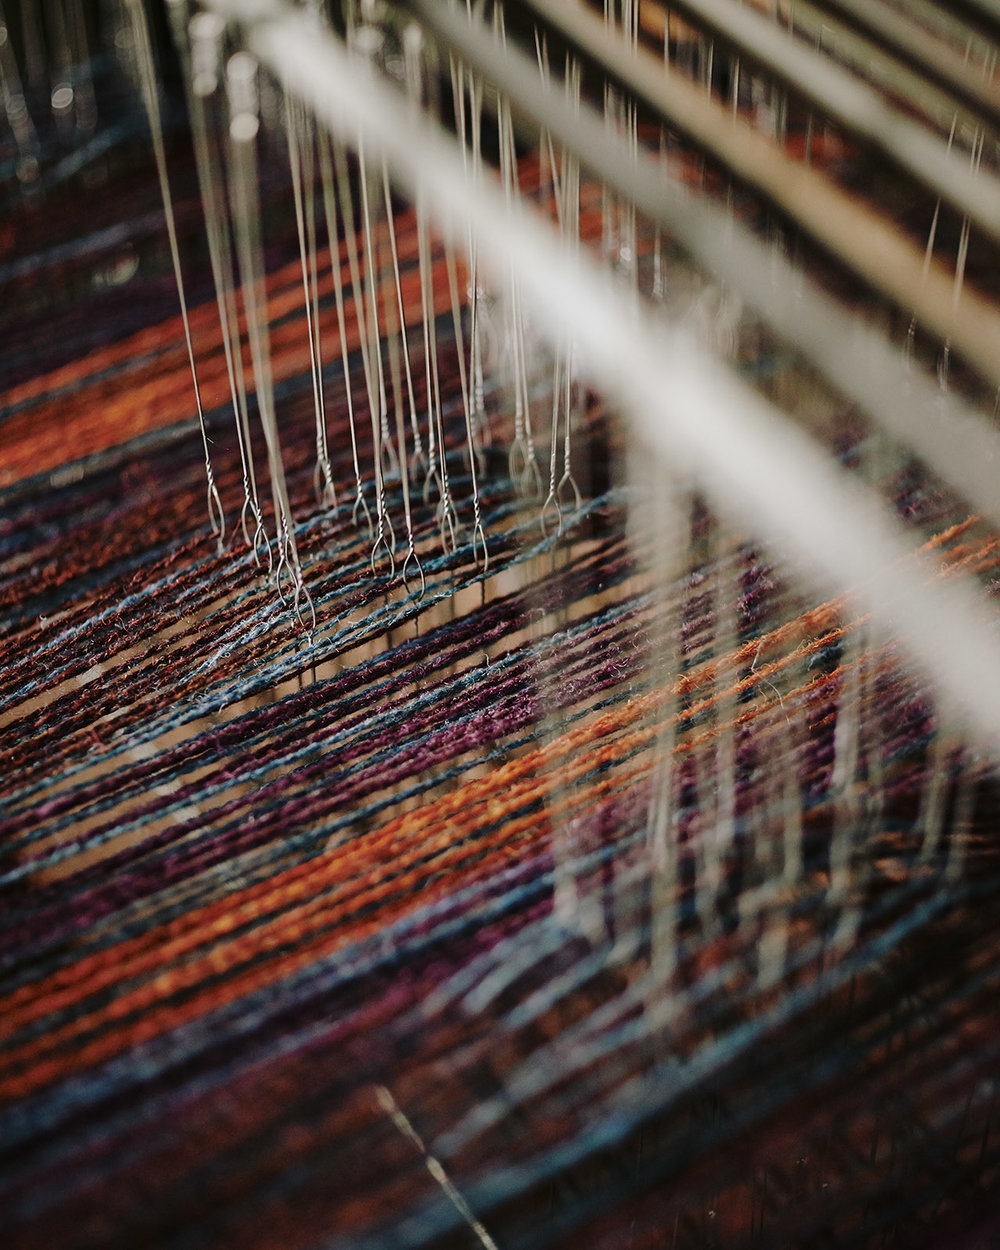 140512-MT-Mill-015-web-1600-px.jpg